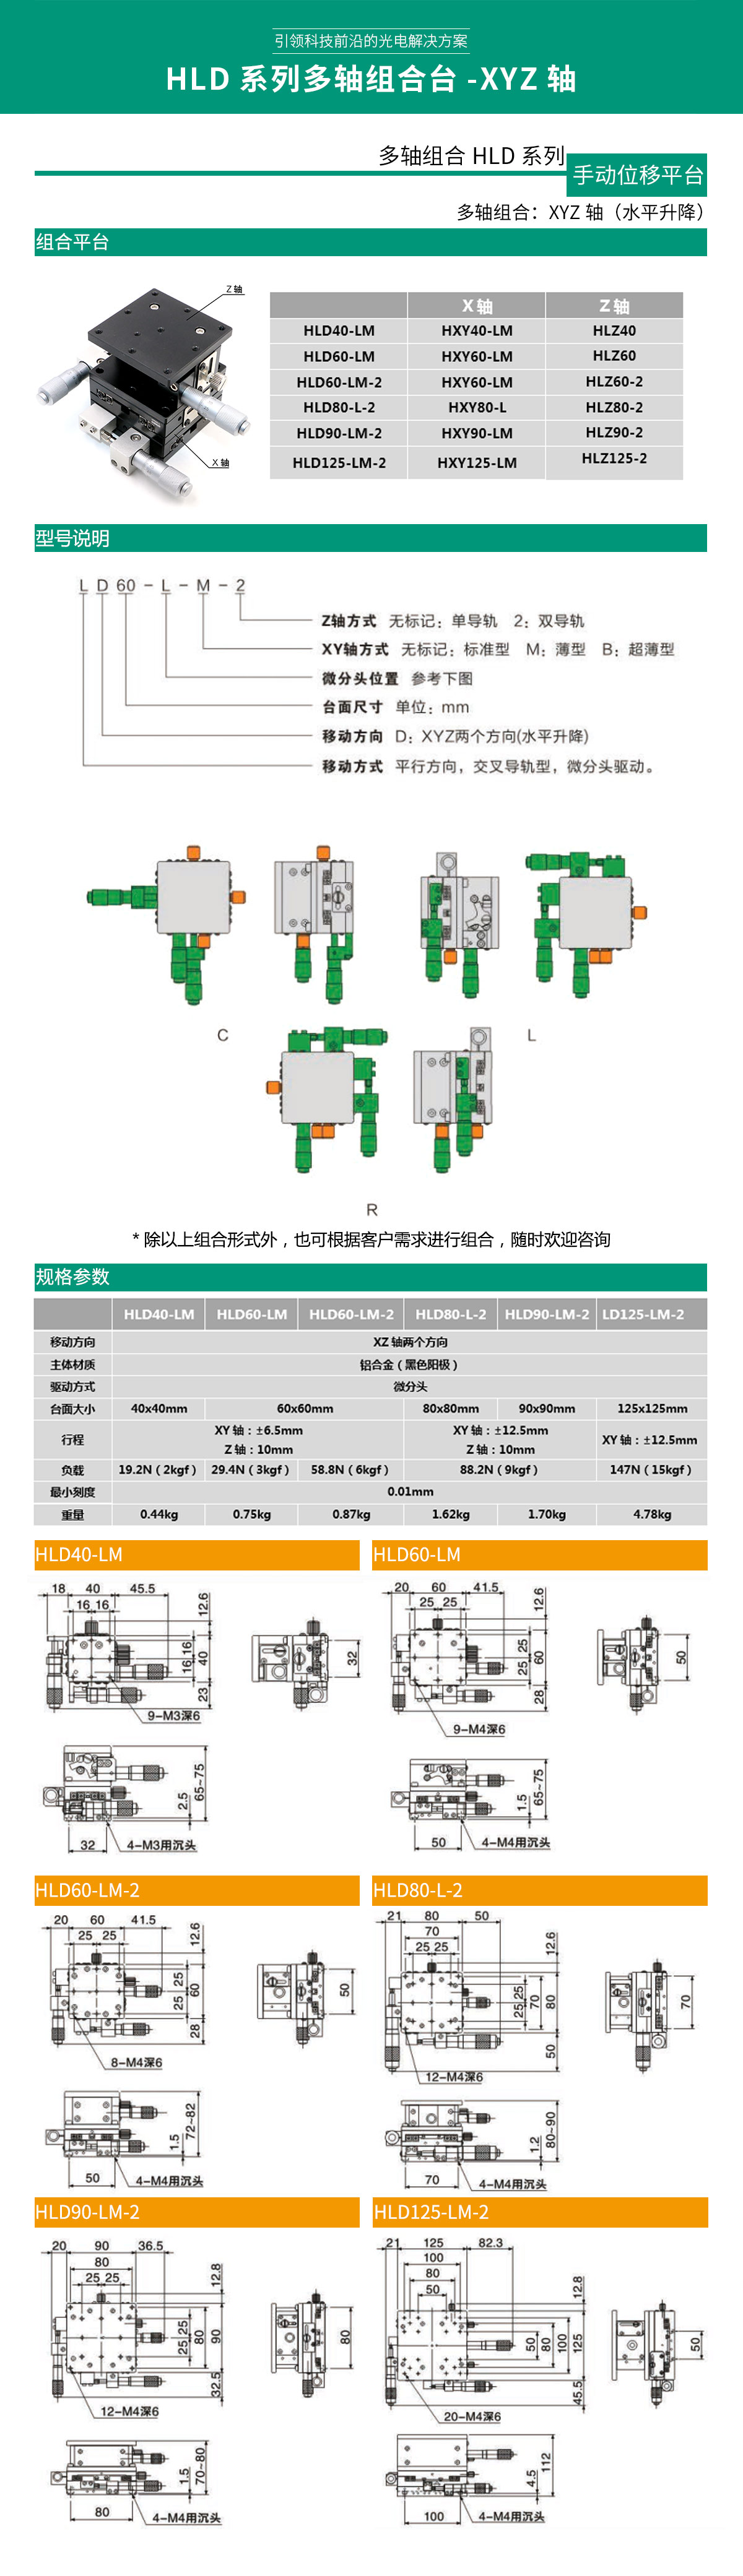 HLD系列多轴组合台-XYZ轴